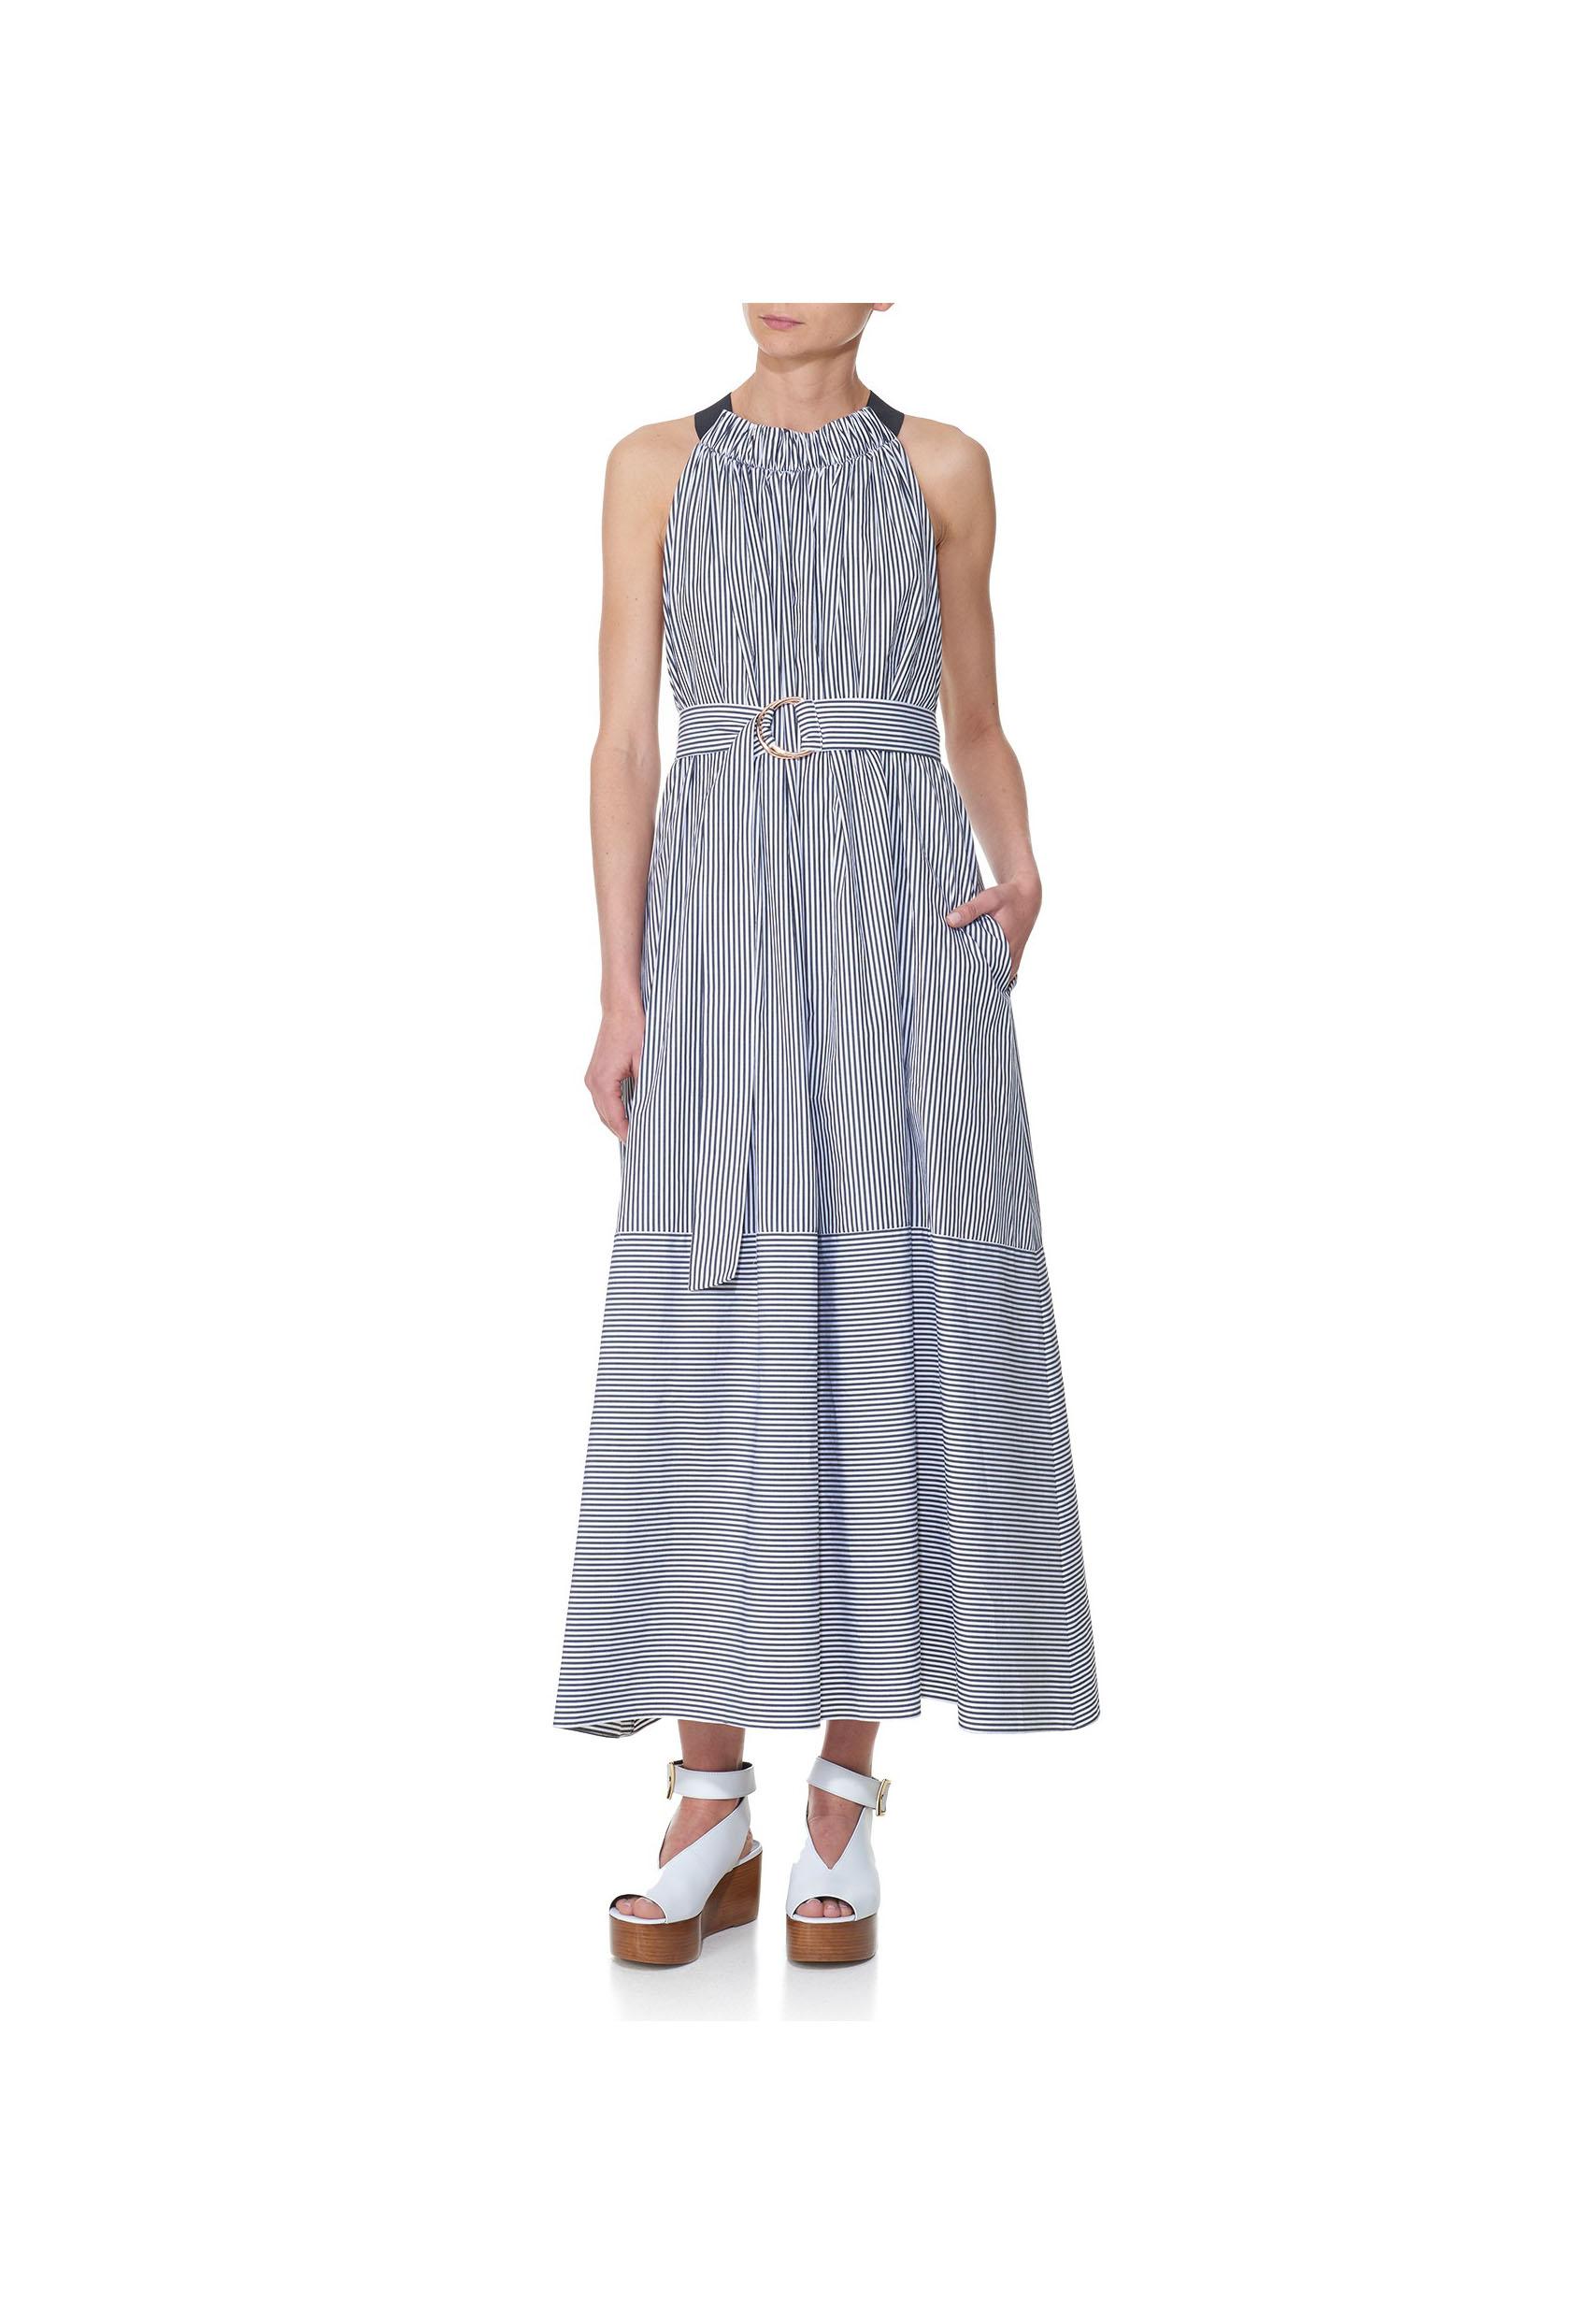 Tibi Striped Shirt Dress